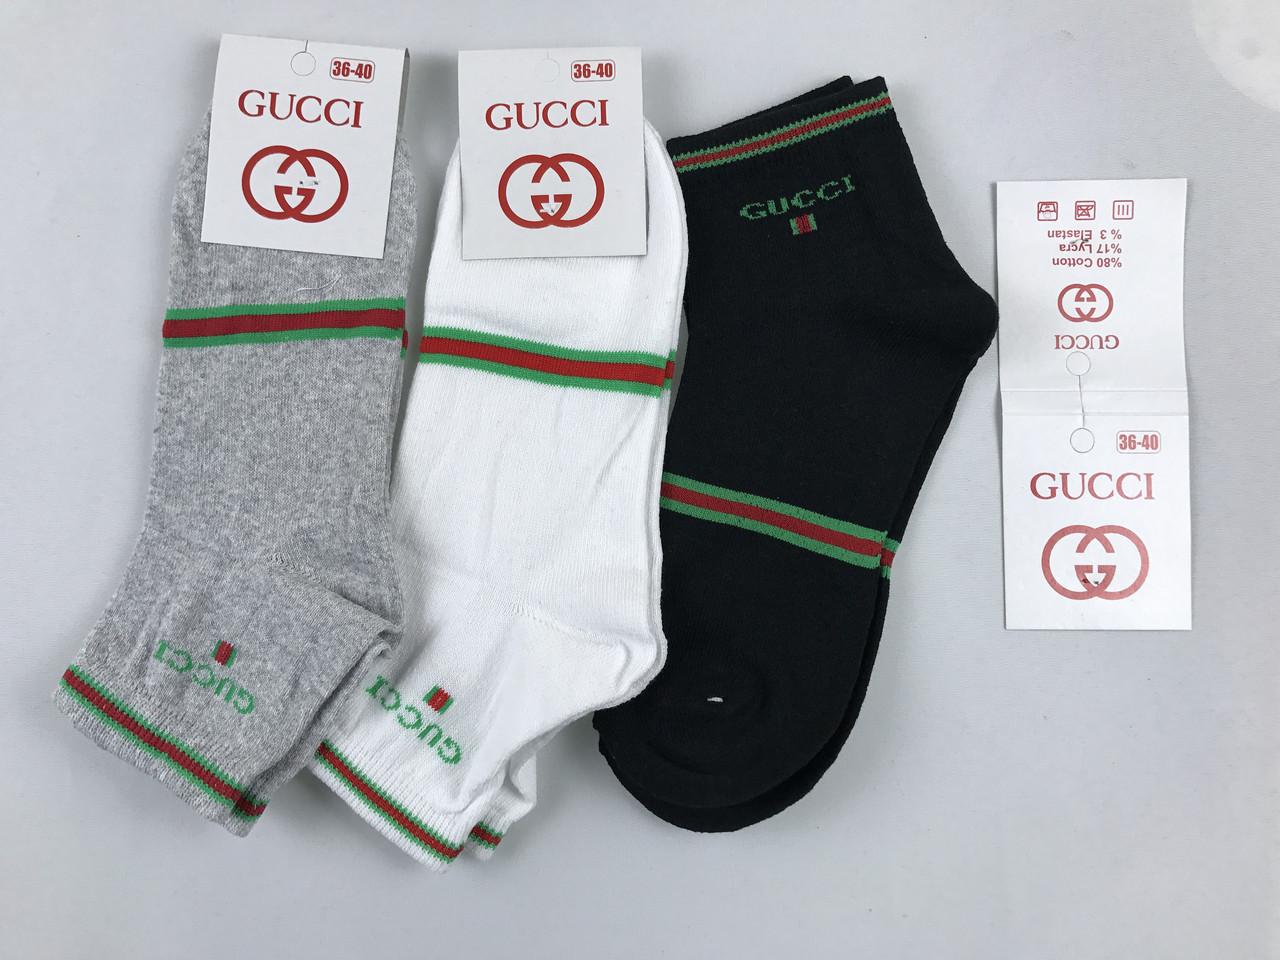 Носки женские Gucci реплика 36-40 Хлопок (12 пар)